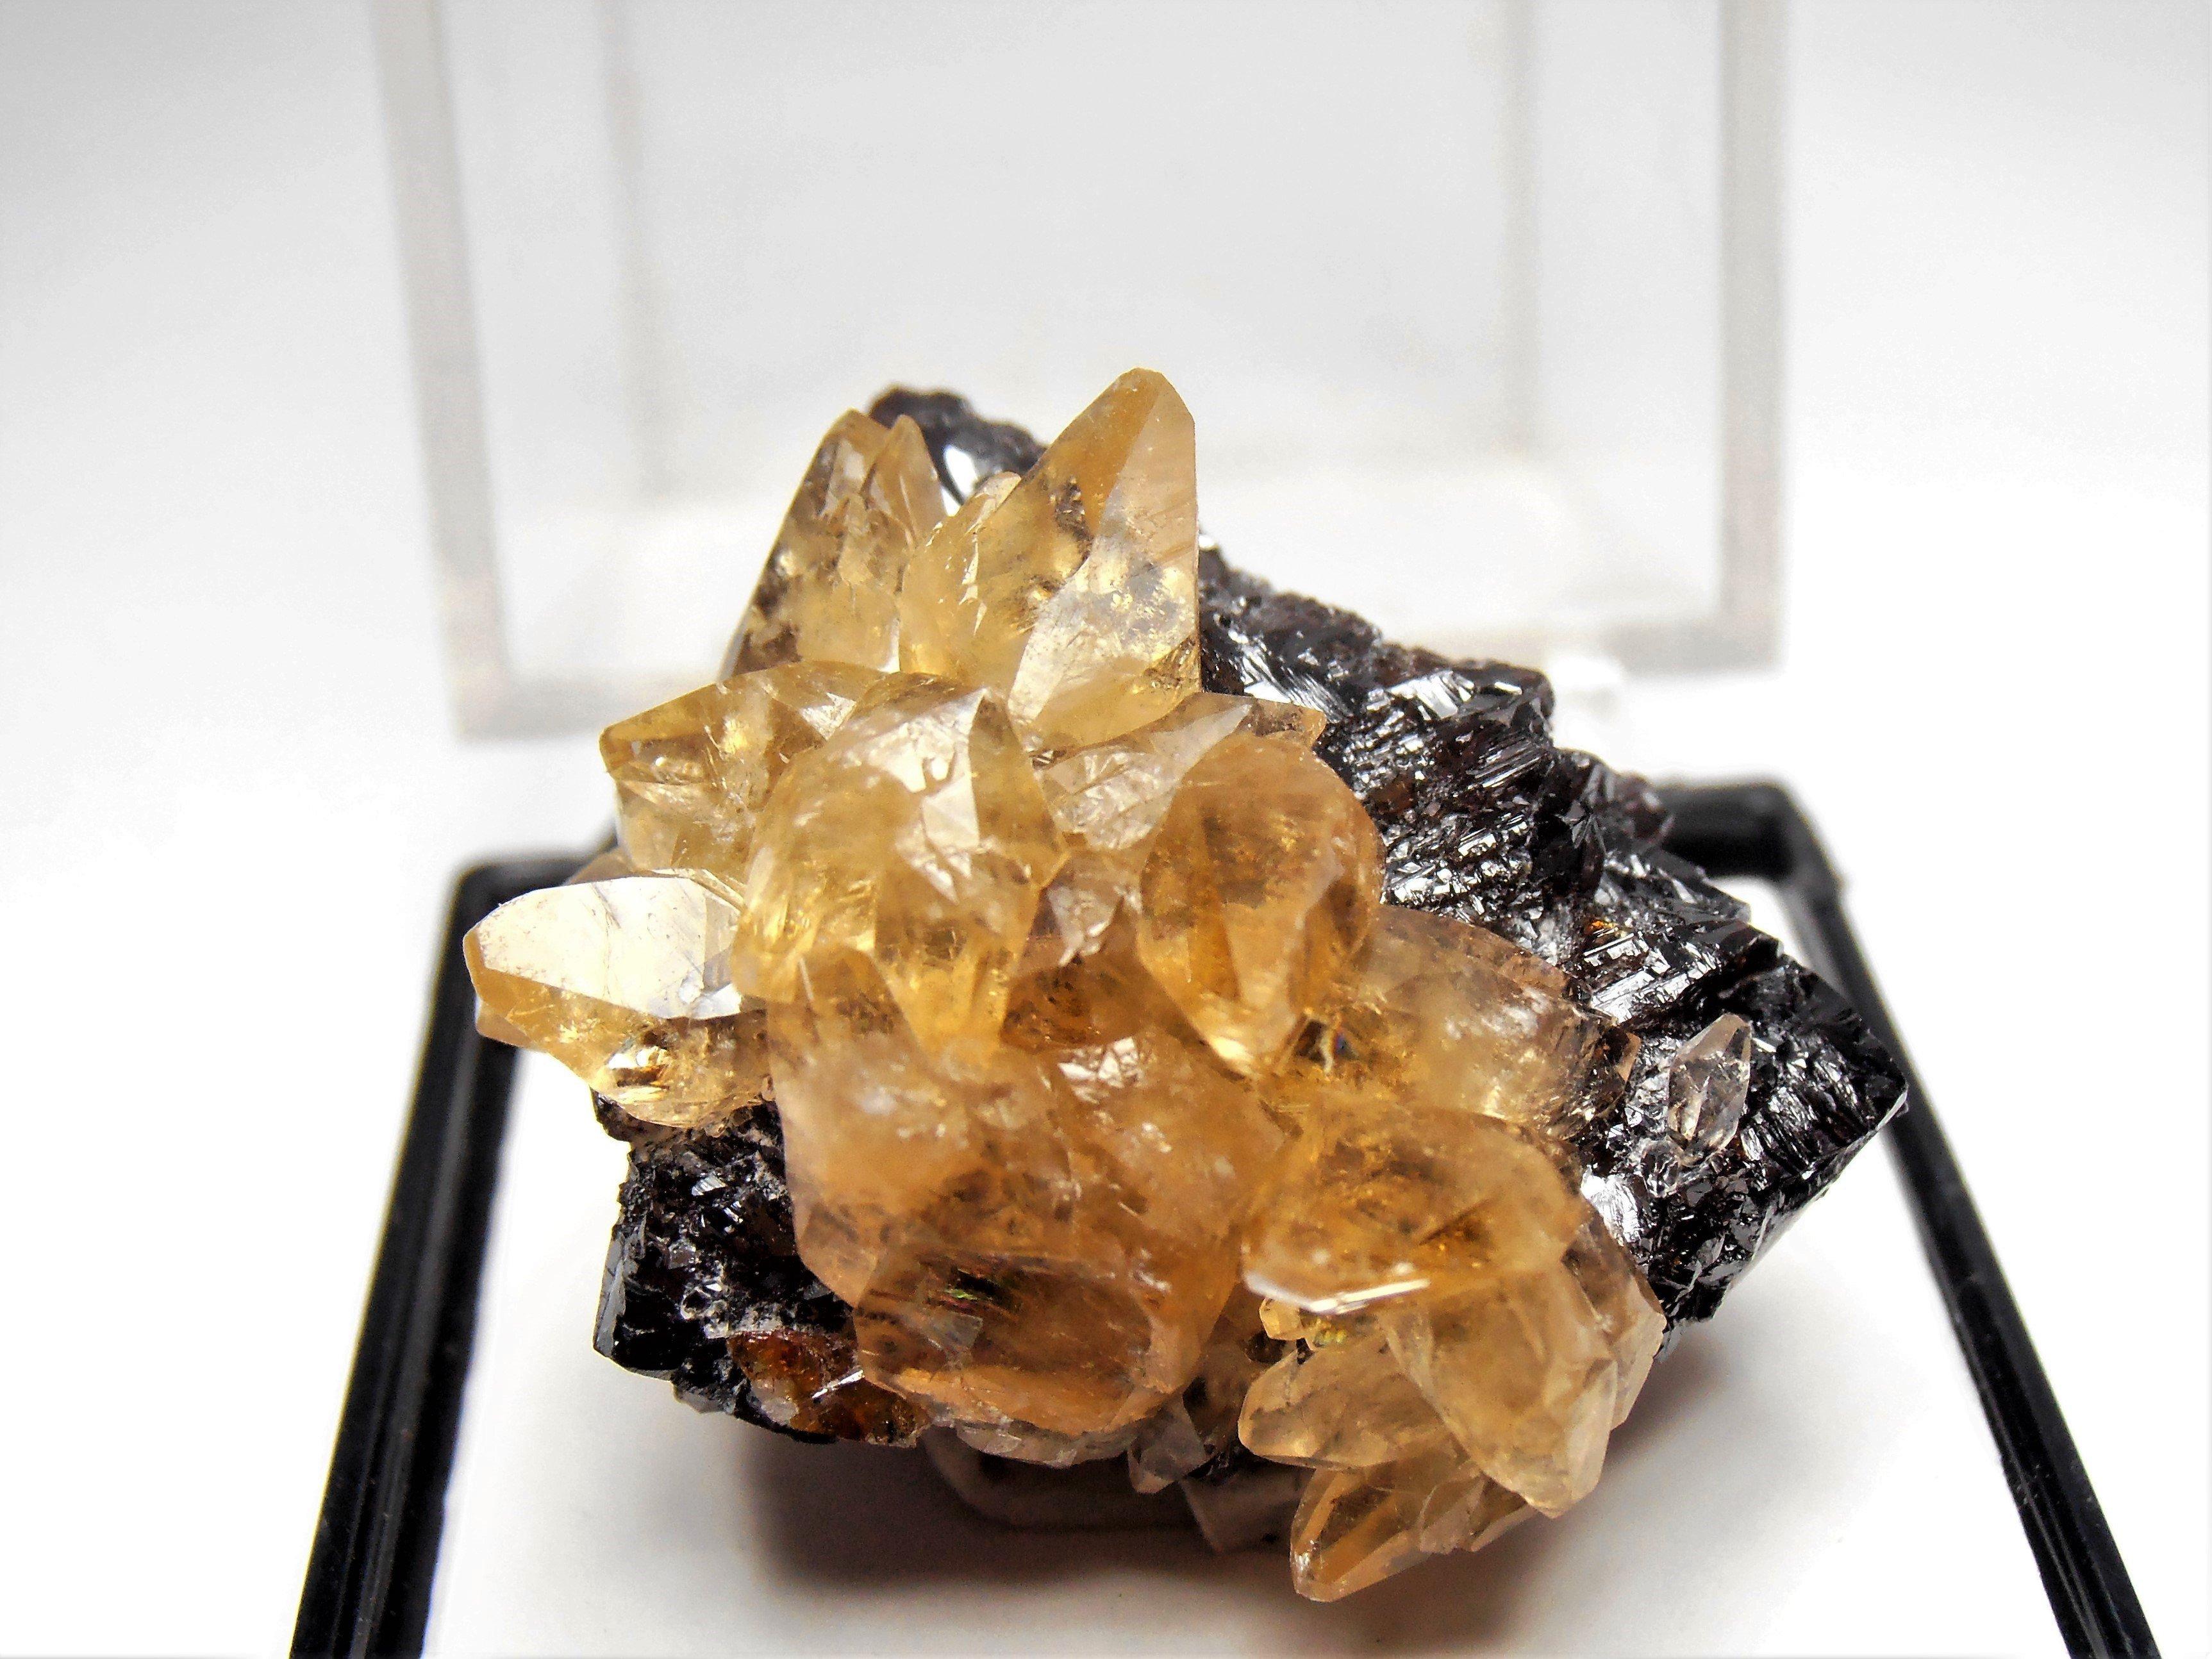 calcite elmwood cumberland mine Tennessee